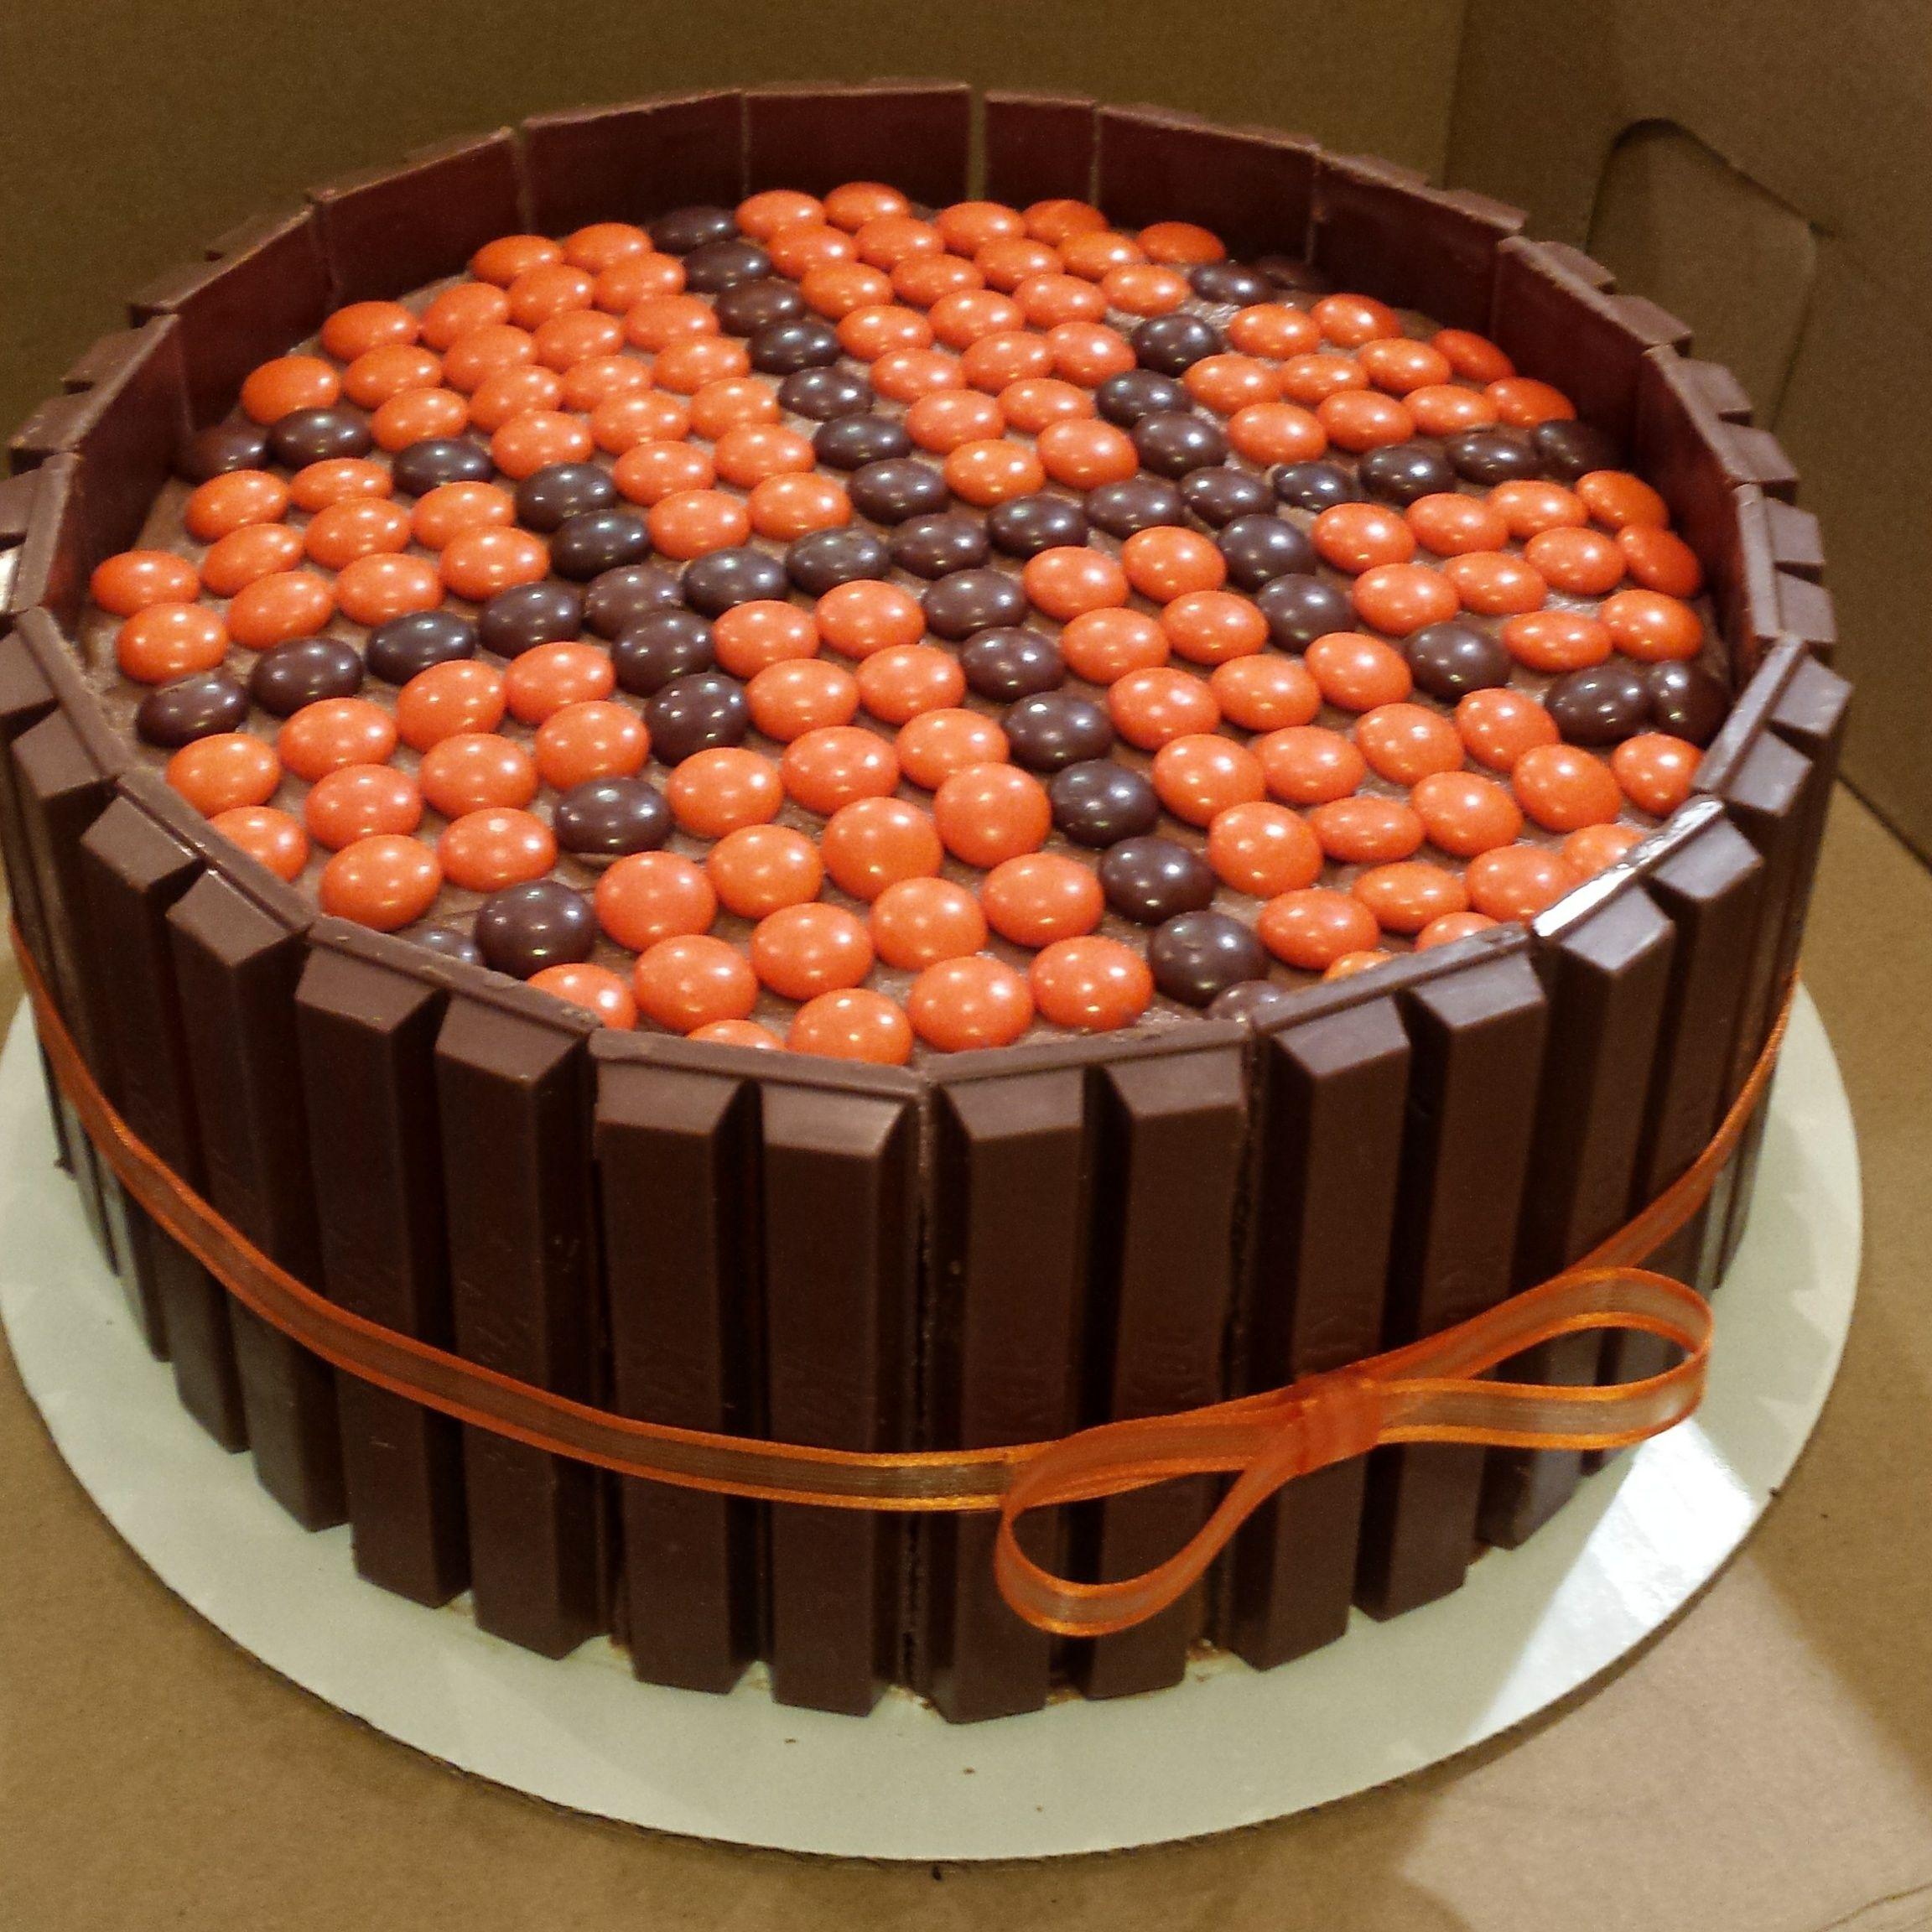 Basketball Birthday Cake Decorations